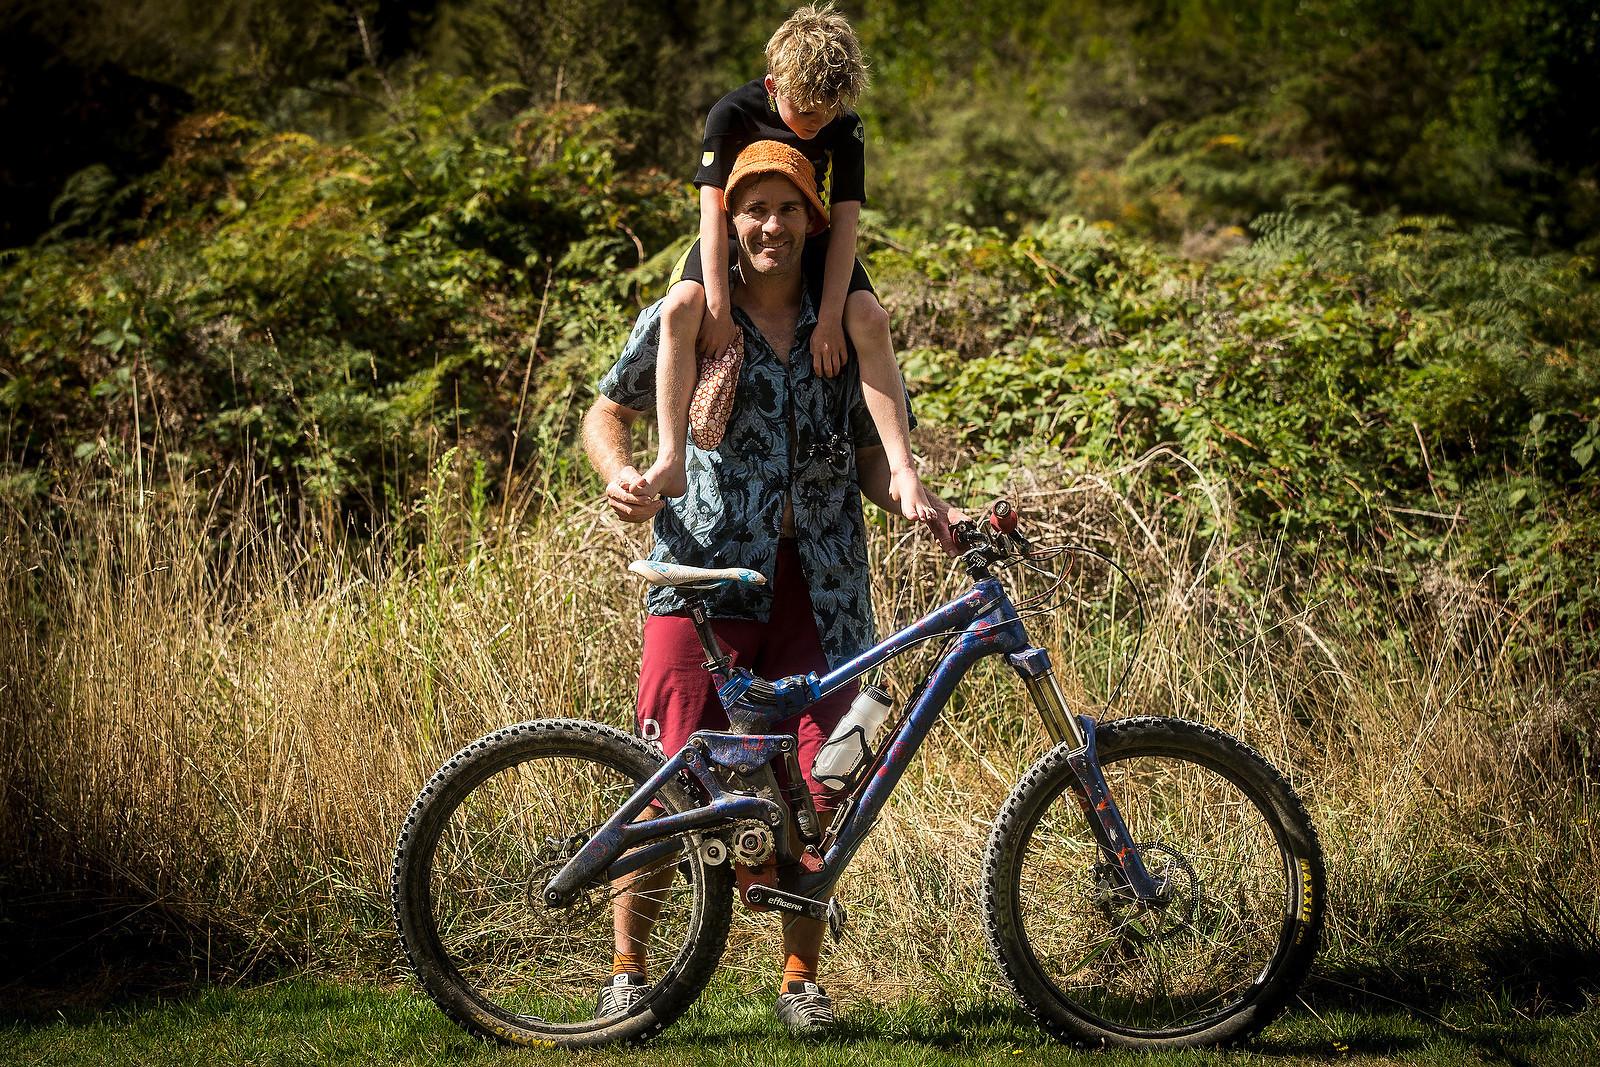 Richard Goldbury's Carbon Home-made Gearbox Bike - Thinking Outside the Box - 13 Glorious Gearbox Bikes - Mountain Biking Pictures - Vital MTB